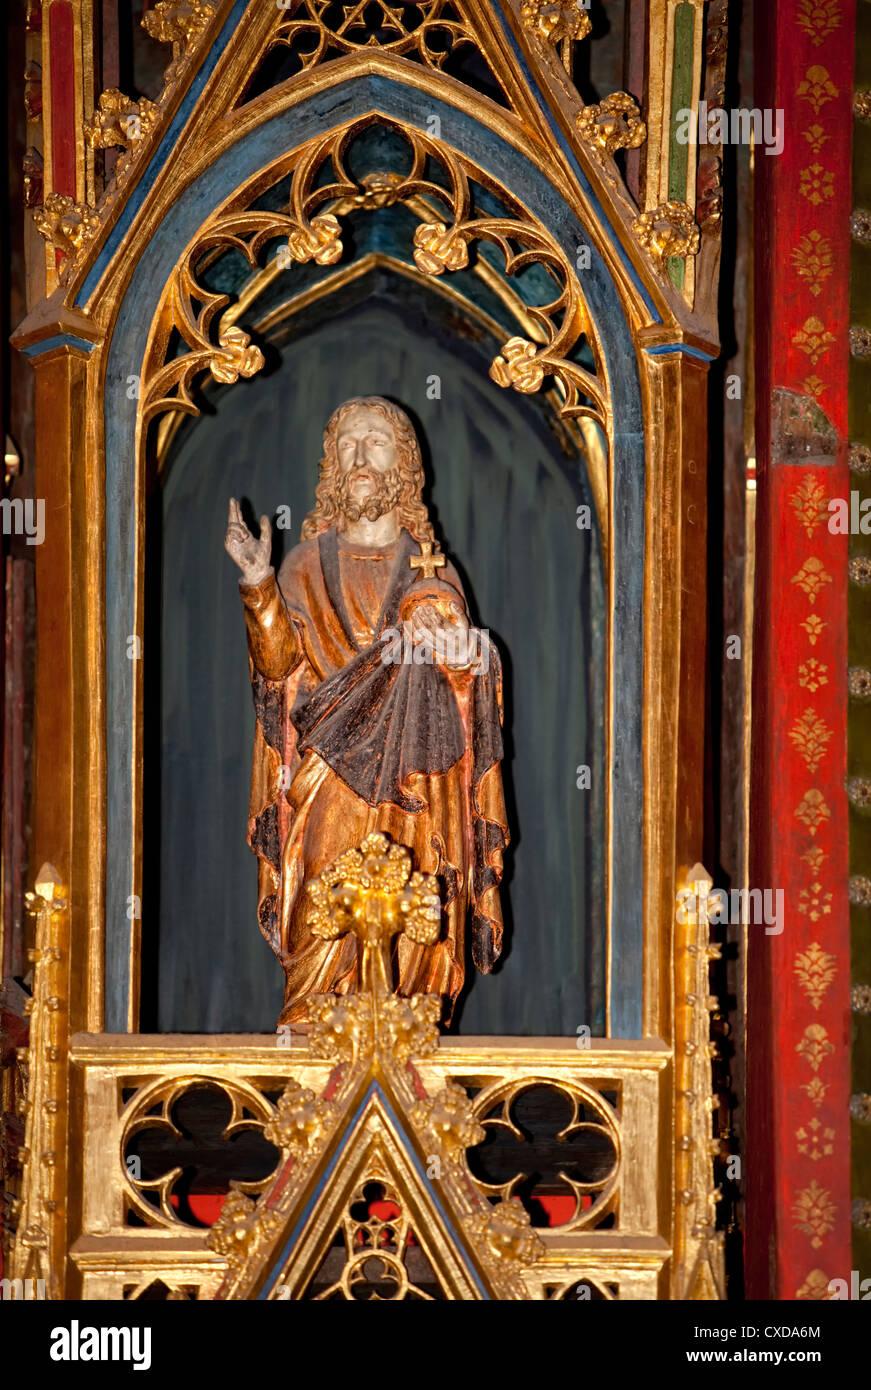 Klaren altar, 14th century, Koelner Dom, Cologne Cathedral, Germany, Europe - Stock Image